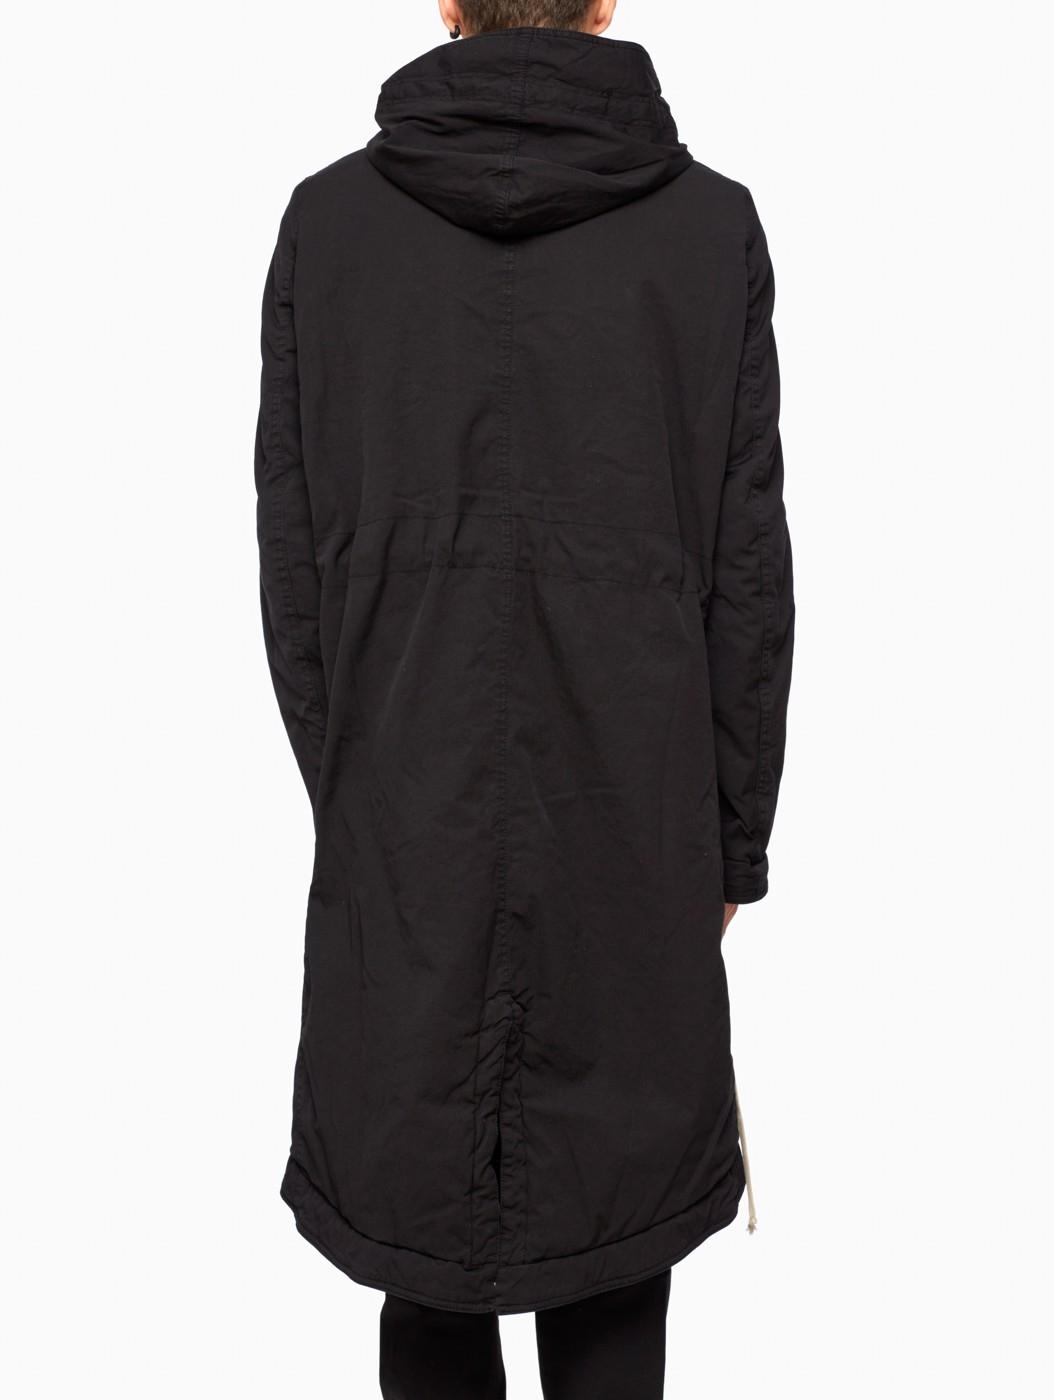 Drkshdw by rick owens Fishtail Parka in Black for Men | Lyst